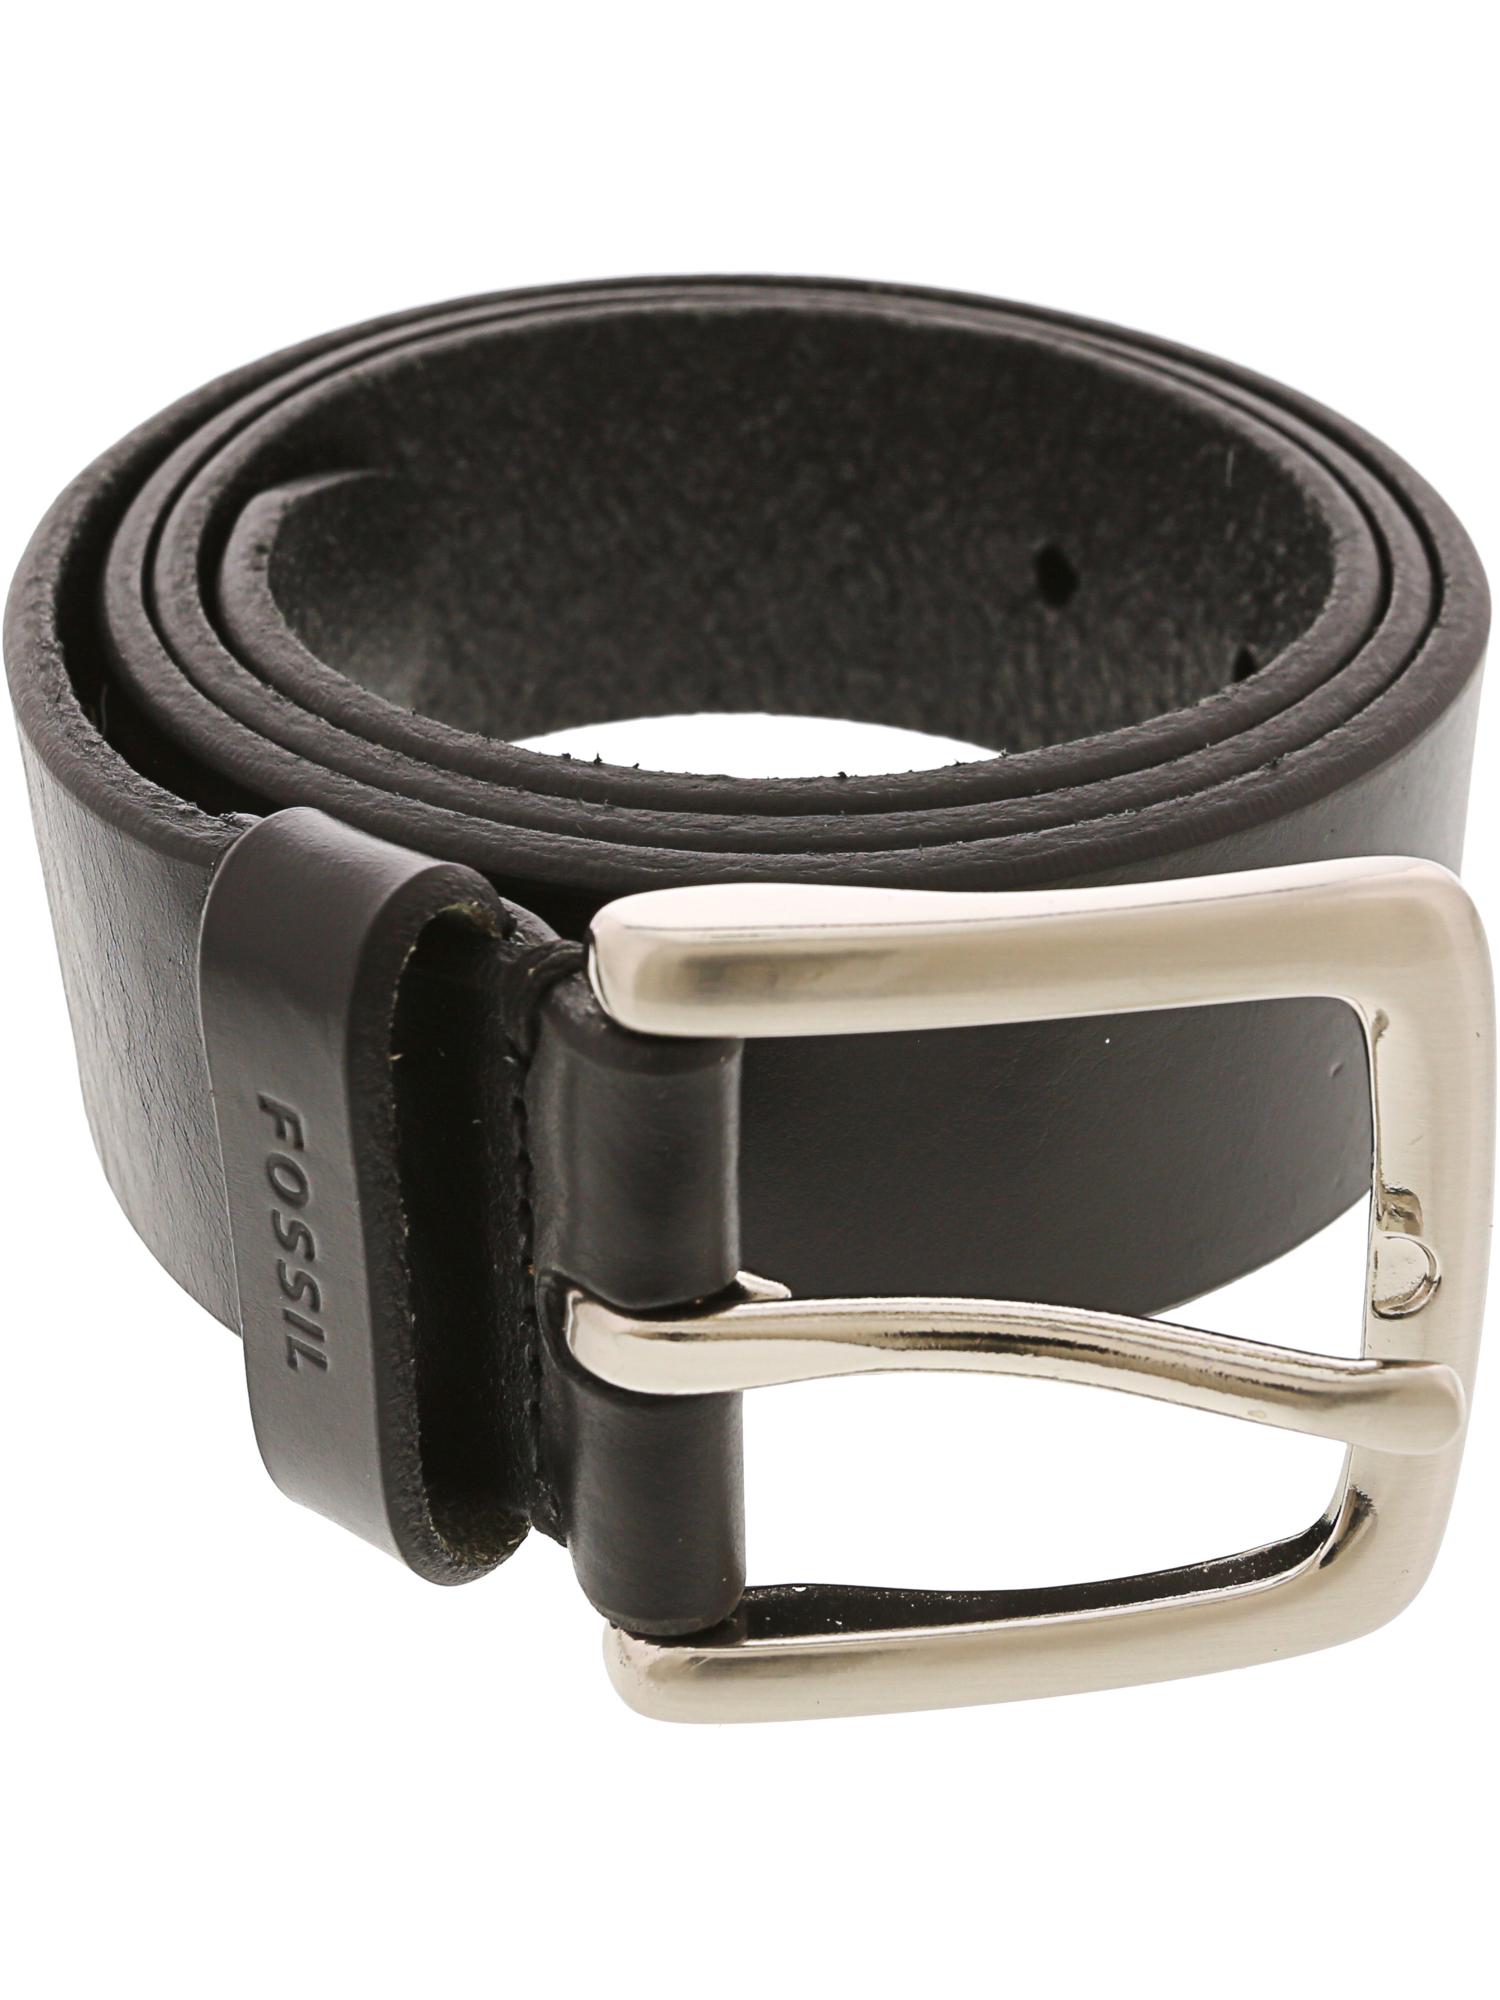 Fossil-Men-039-s-Joe-Leather-Belt thumbnail 8